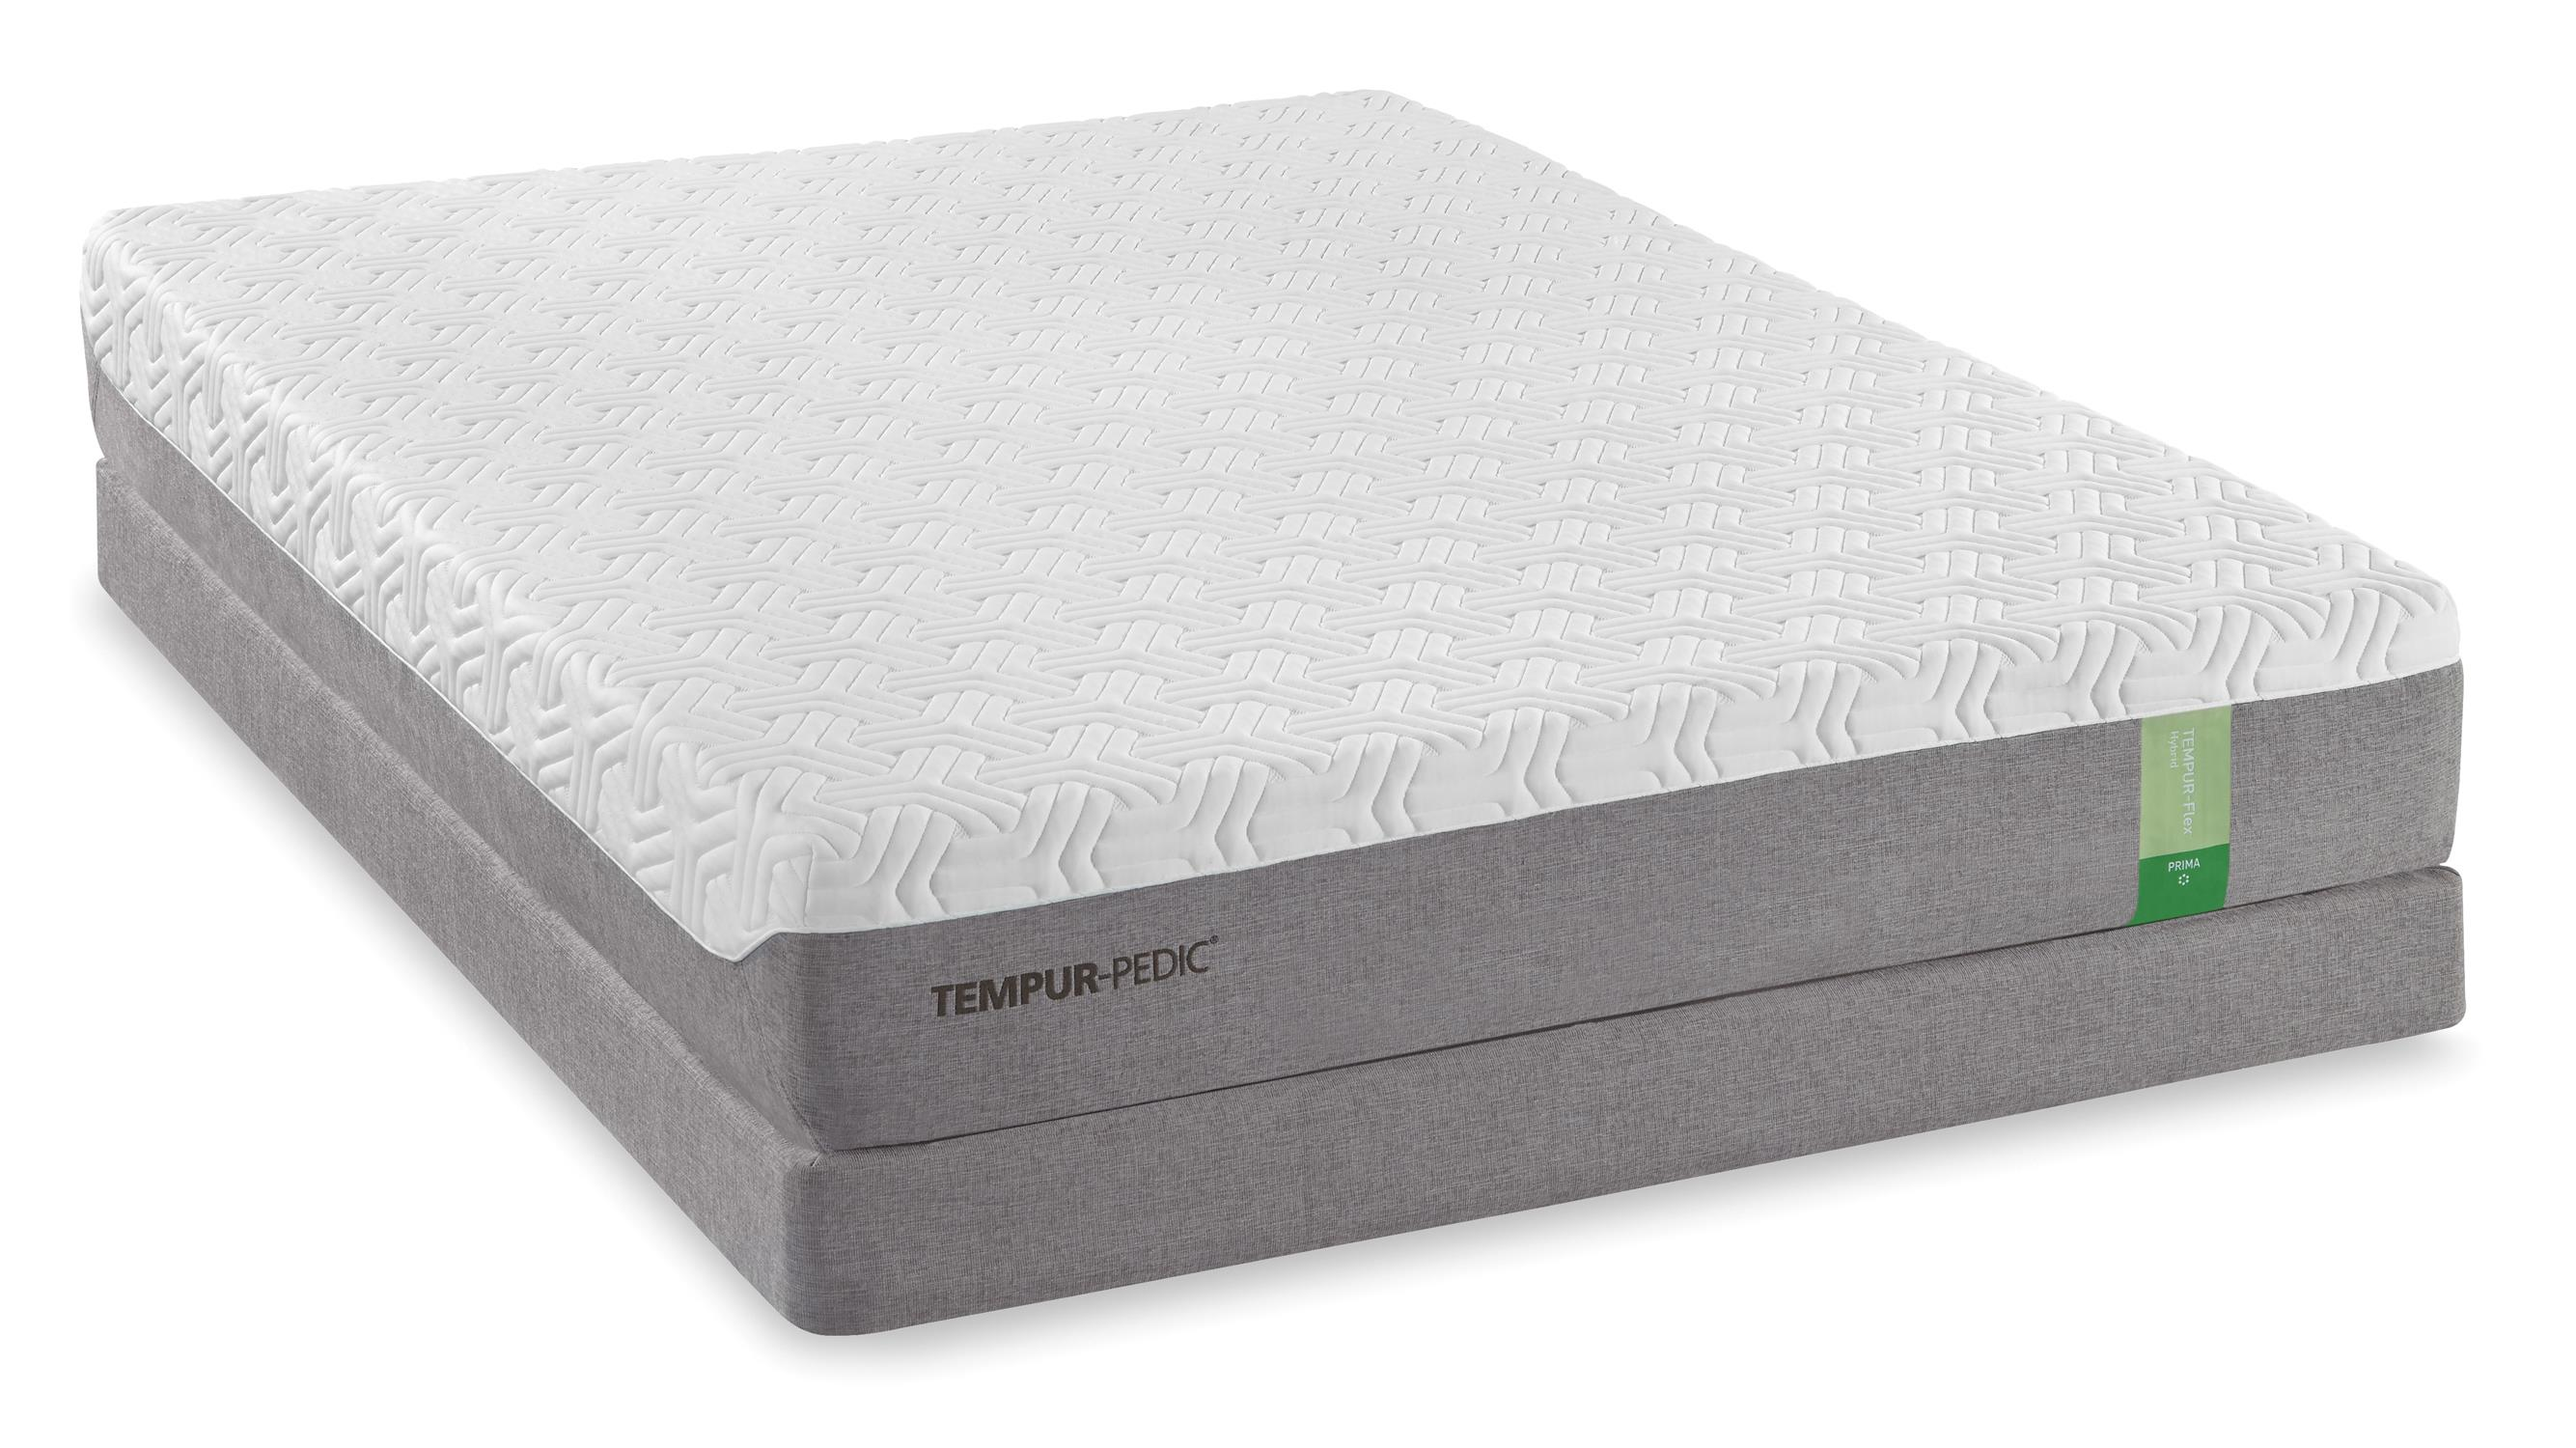 Tempur-Pedic® TEMPUR-Flex Prima King Medium Firm Mattress Set - Item Number: 10115270+2x25565220